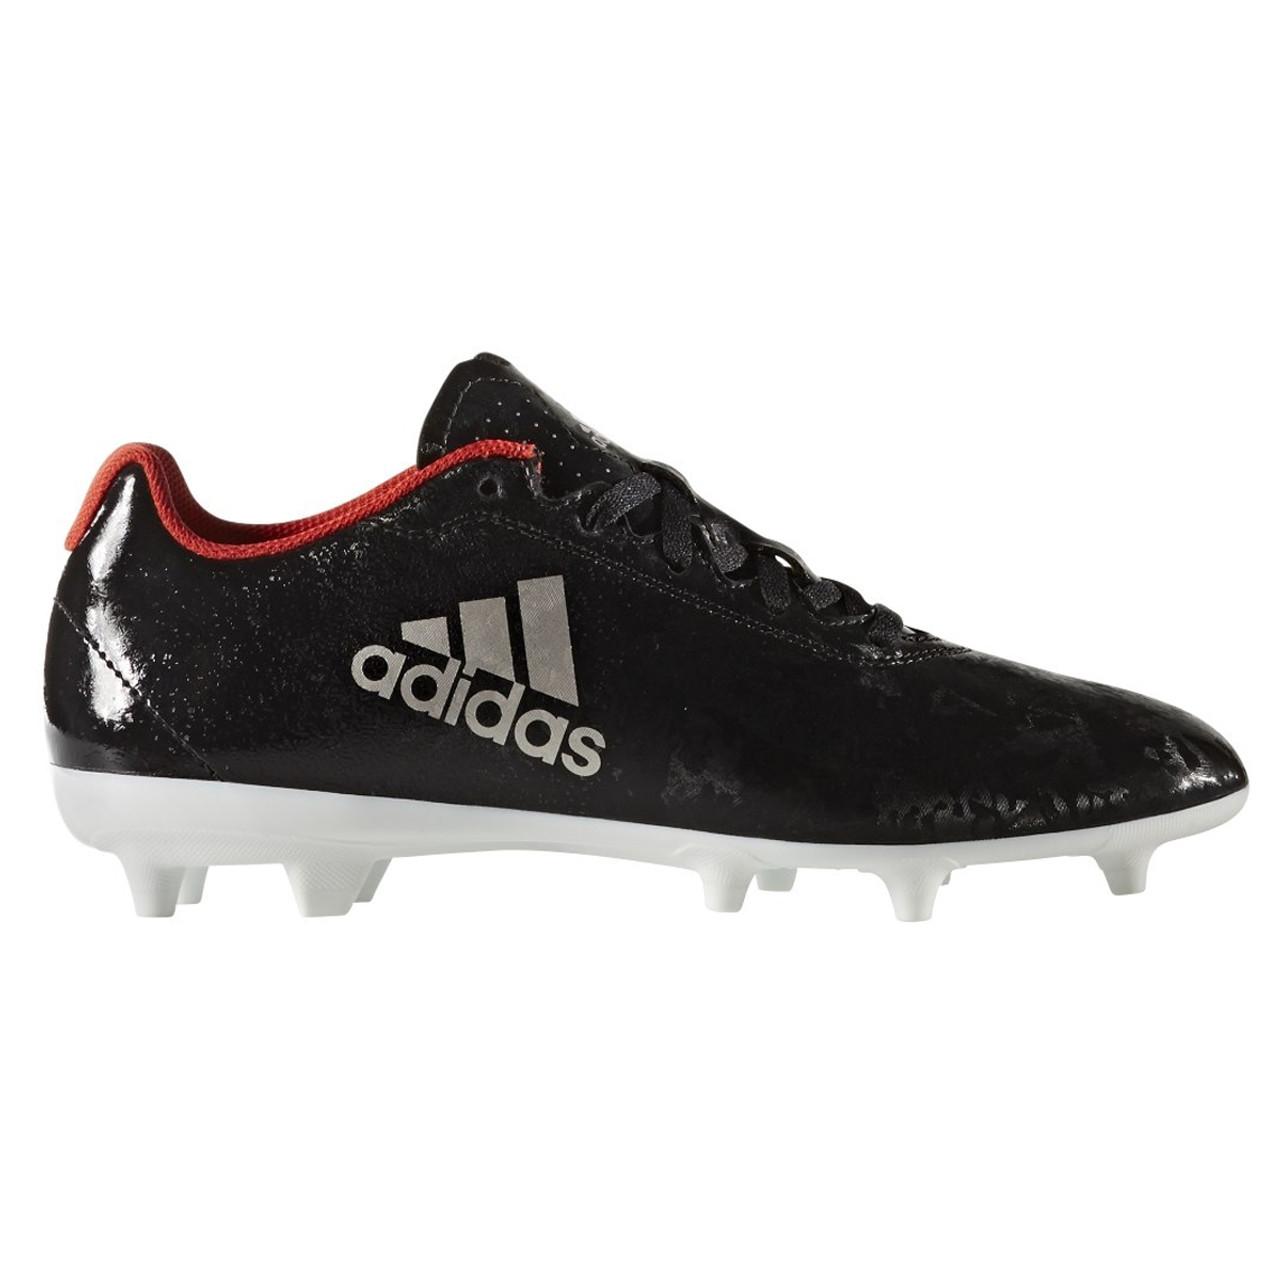 Adidas X 17.4 FG Women's Soccer Cleats